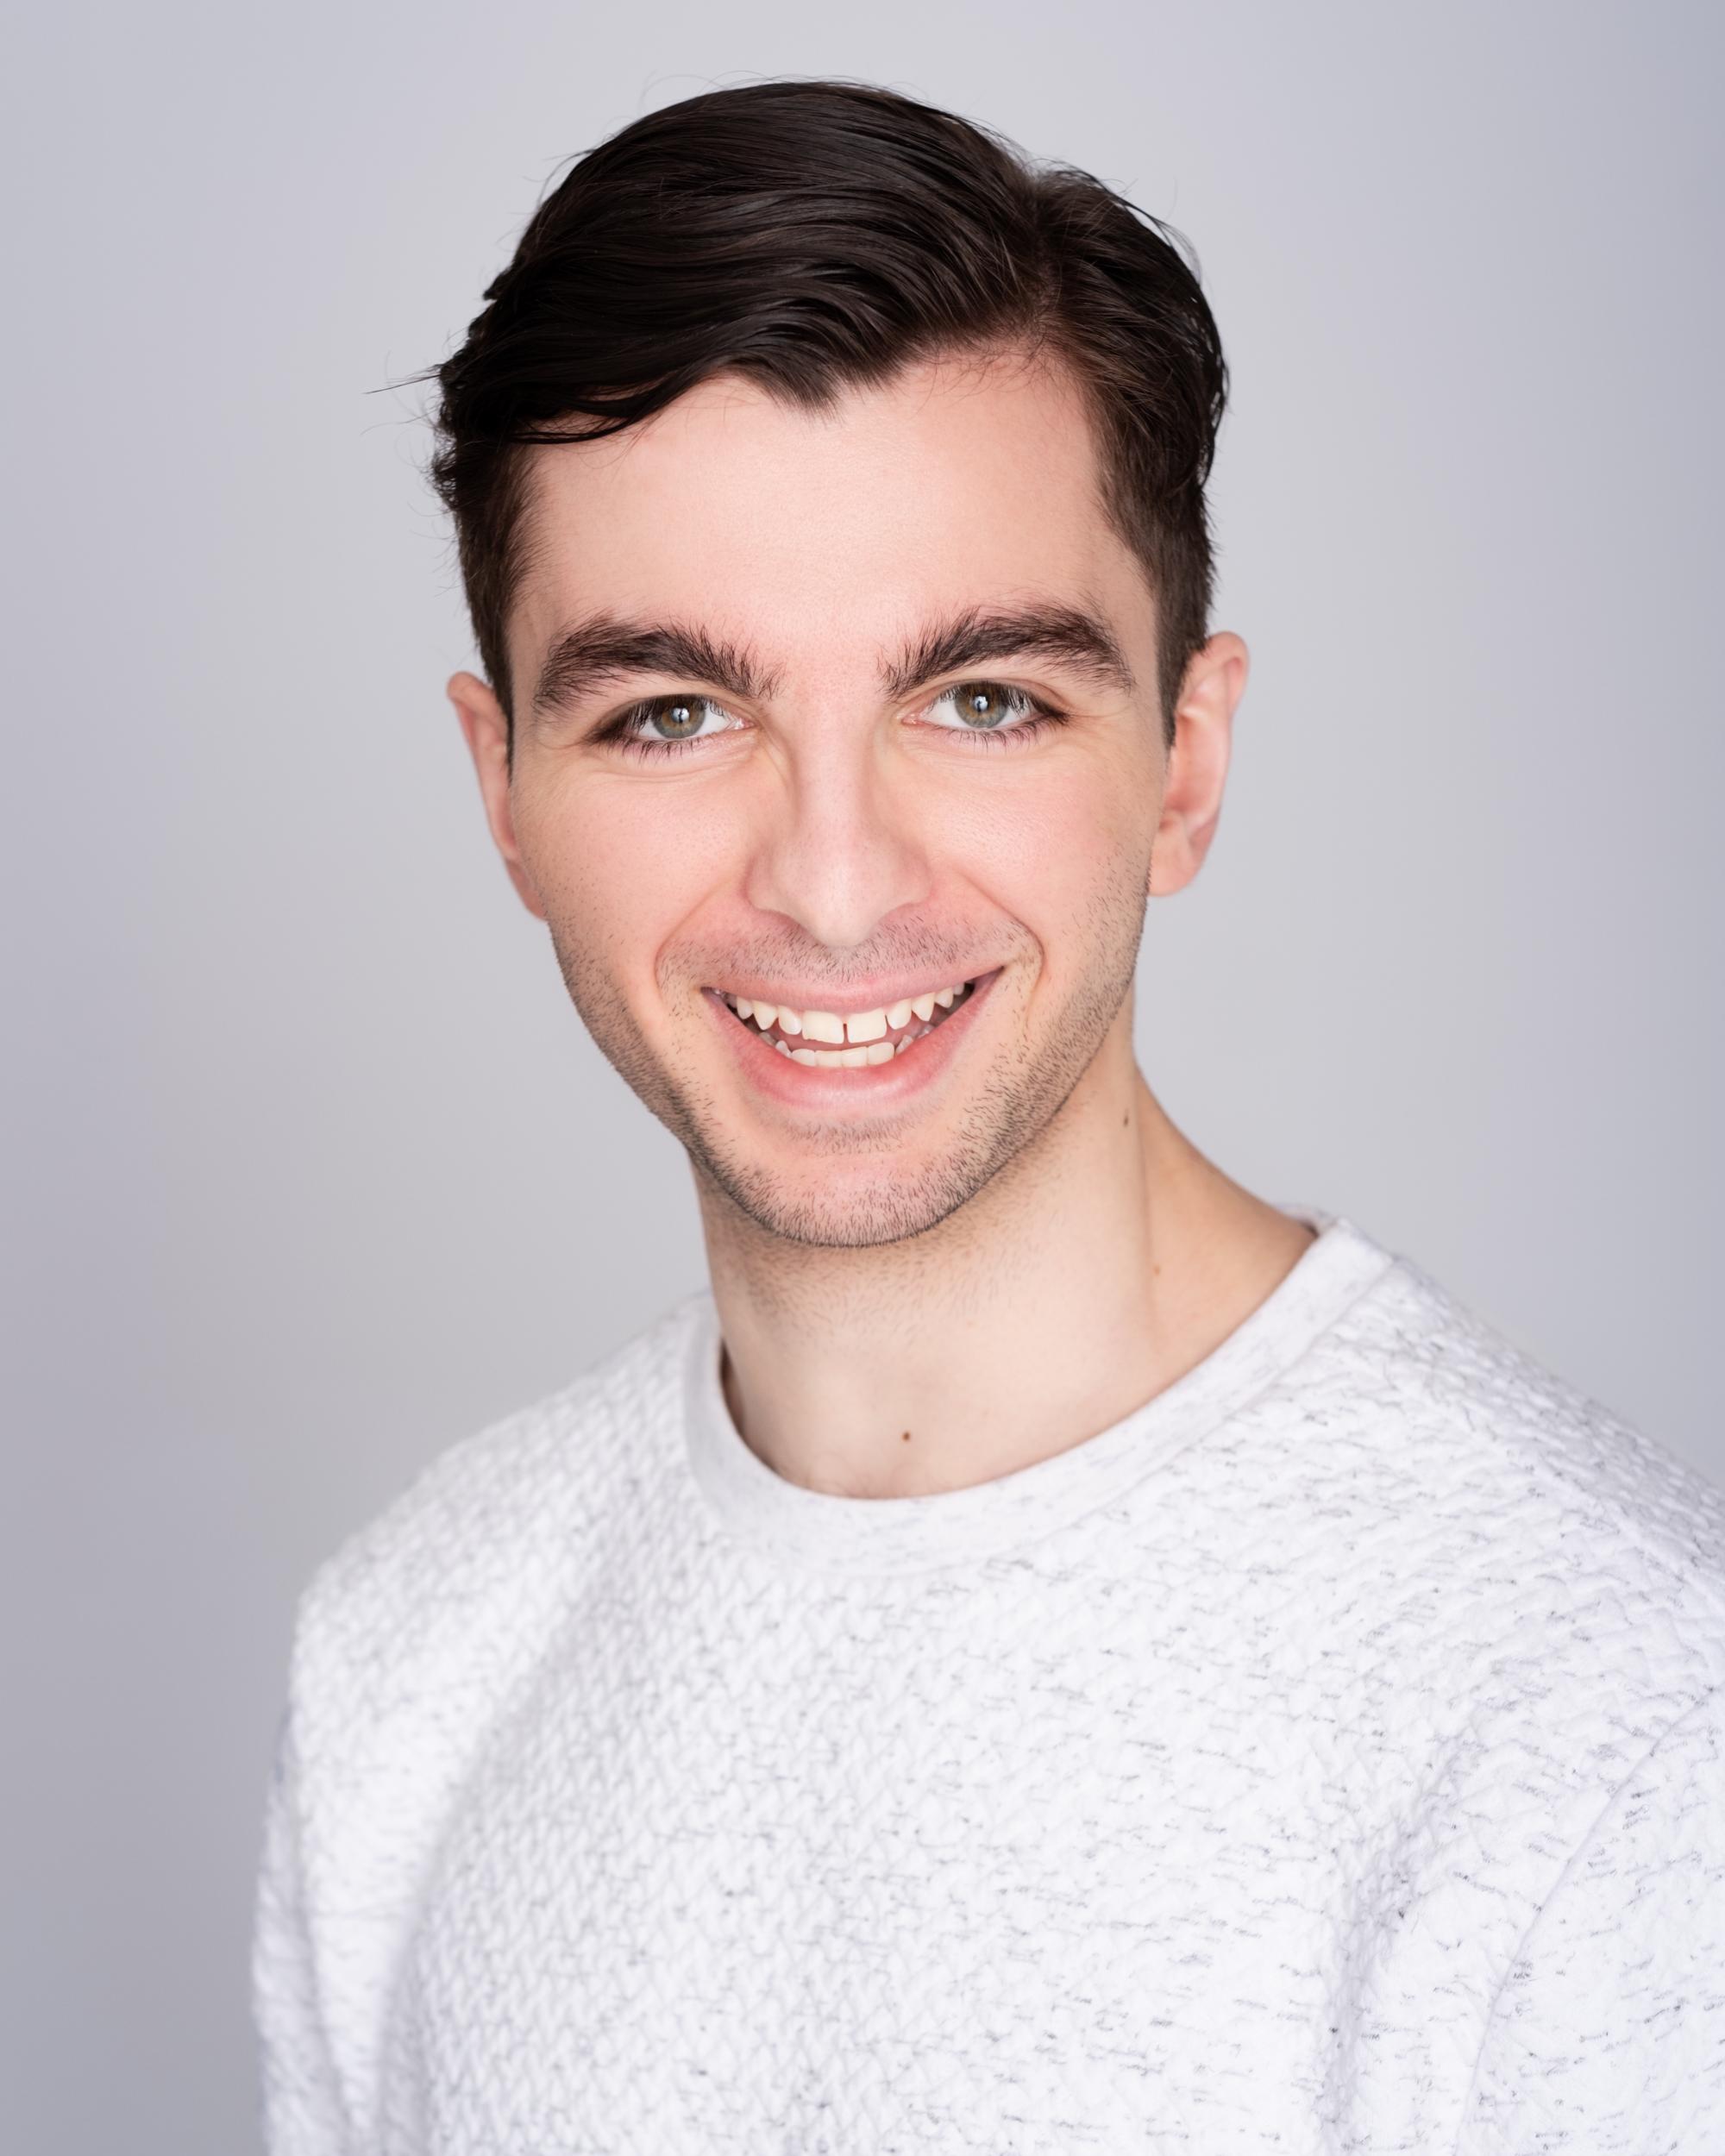 Alex Hatzikostas Melbourne Actors Headshot